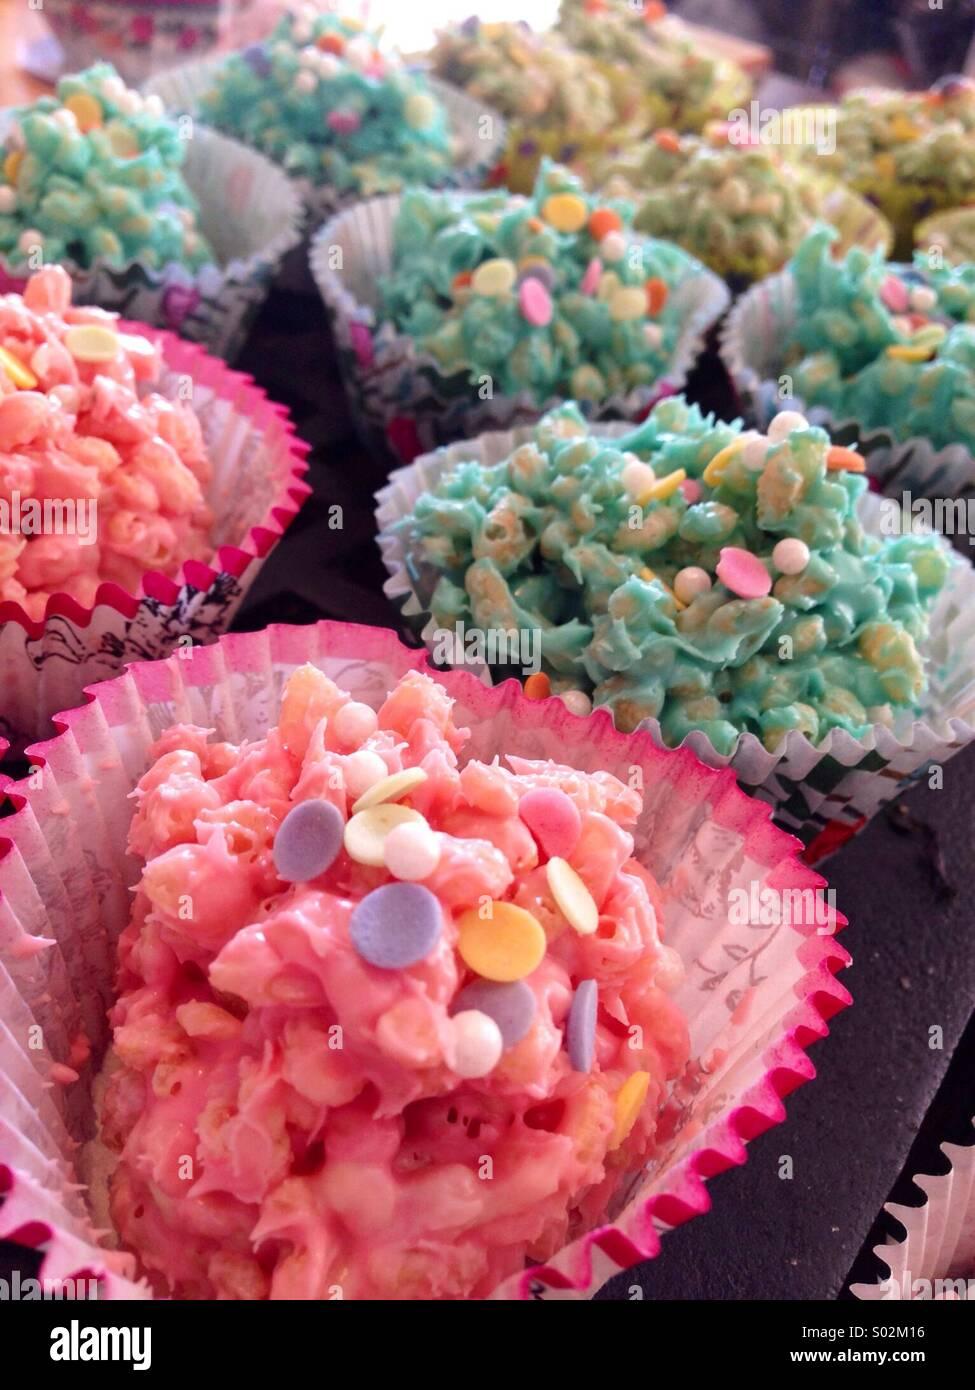 Rice cakes - Stock Image